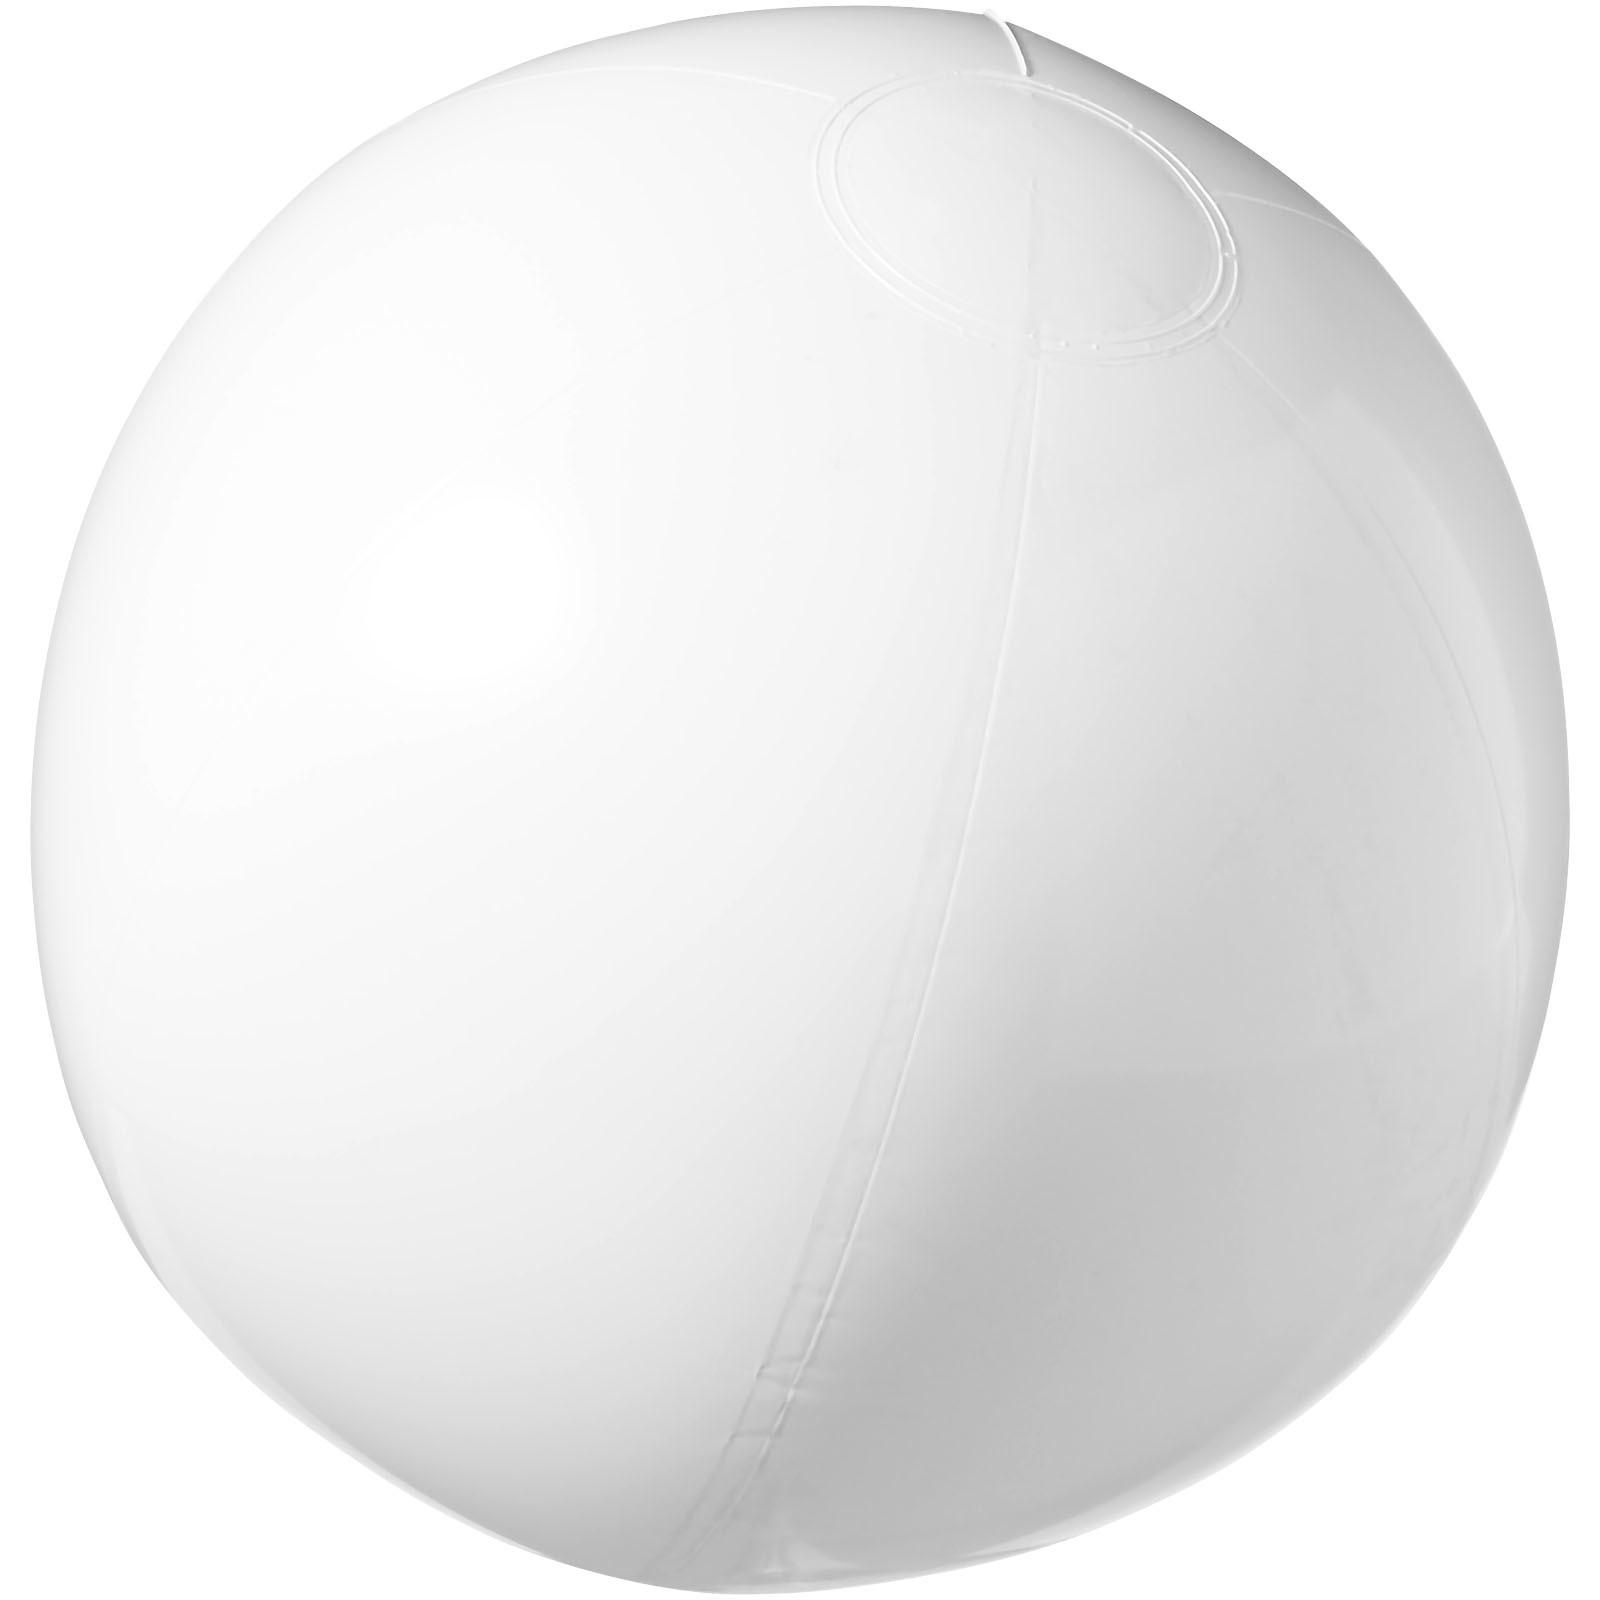 Neprůhledný plážový míč Bahamas - Bílá